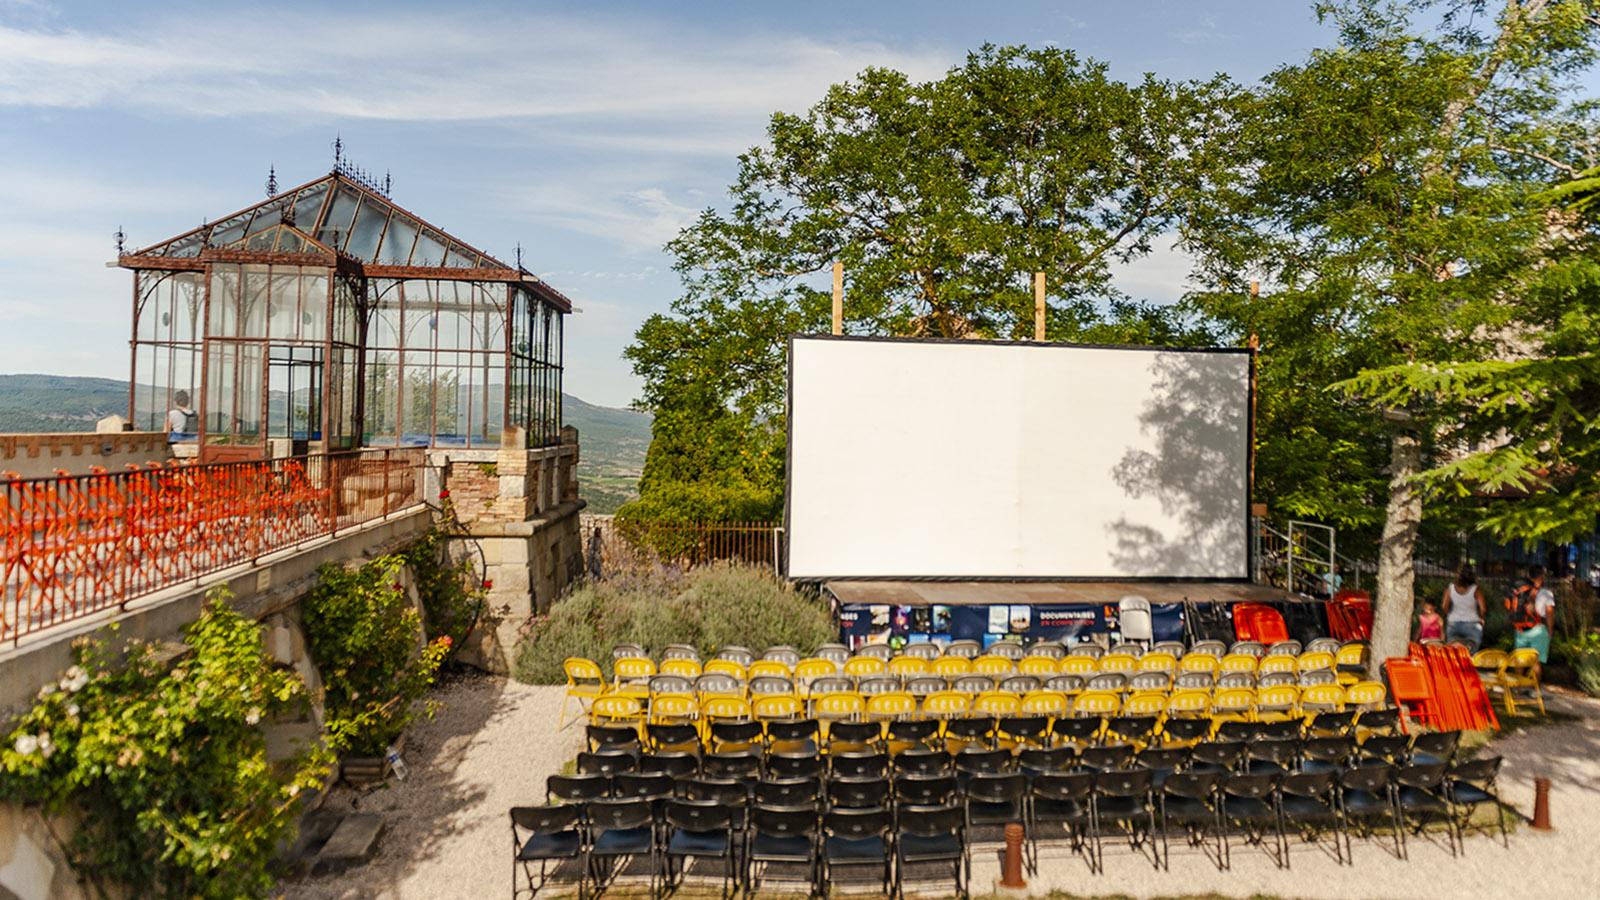 Festival du Film Insolite: das Festivalgelände. Foto: Hilke Maunder